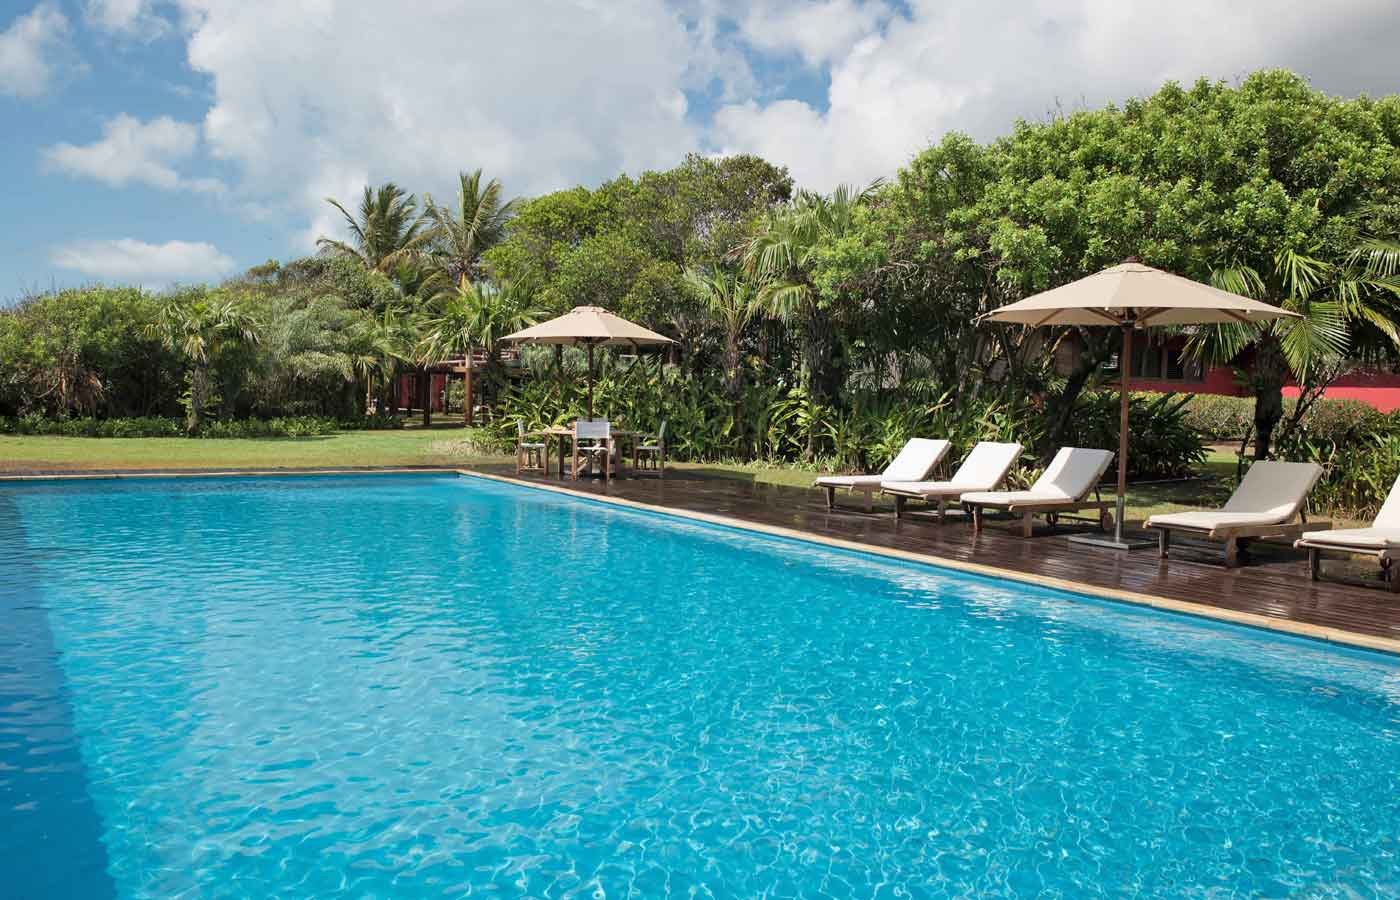 Gorgeous swimming pool at the Pousada Tutabel in Trancoso, Bahia in Brazil